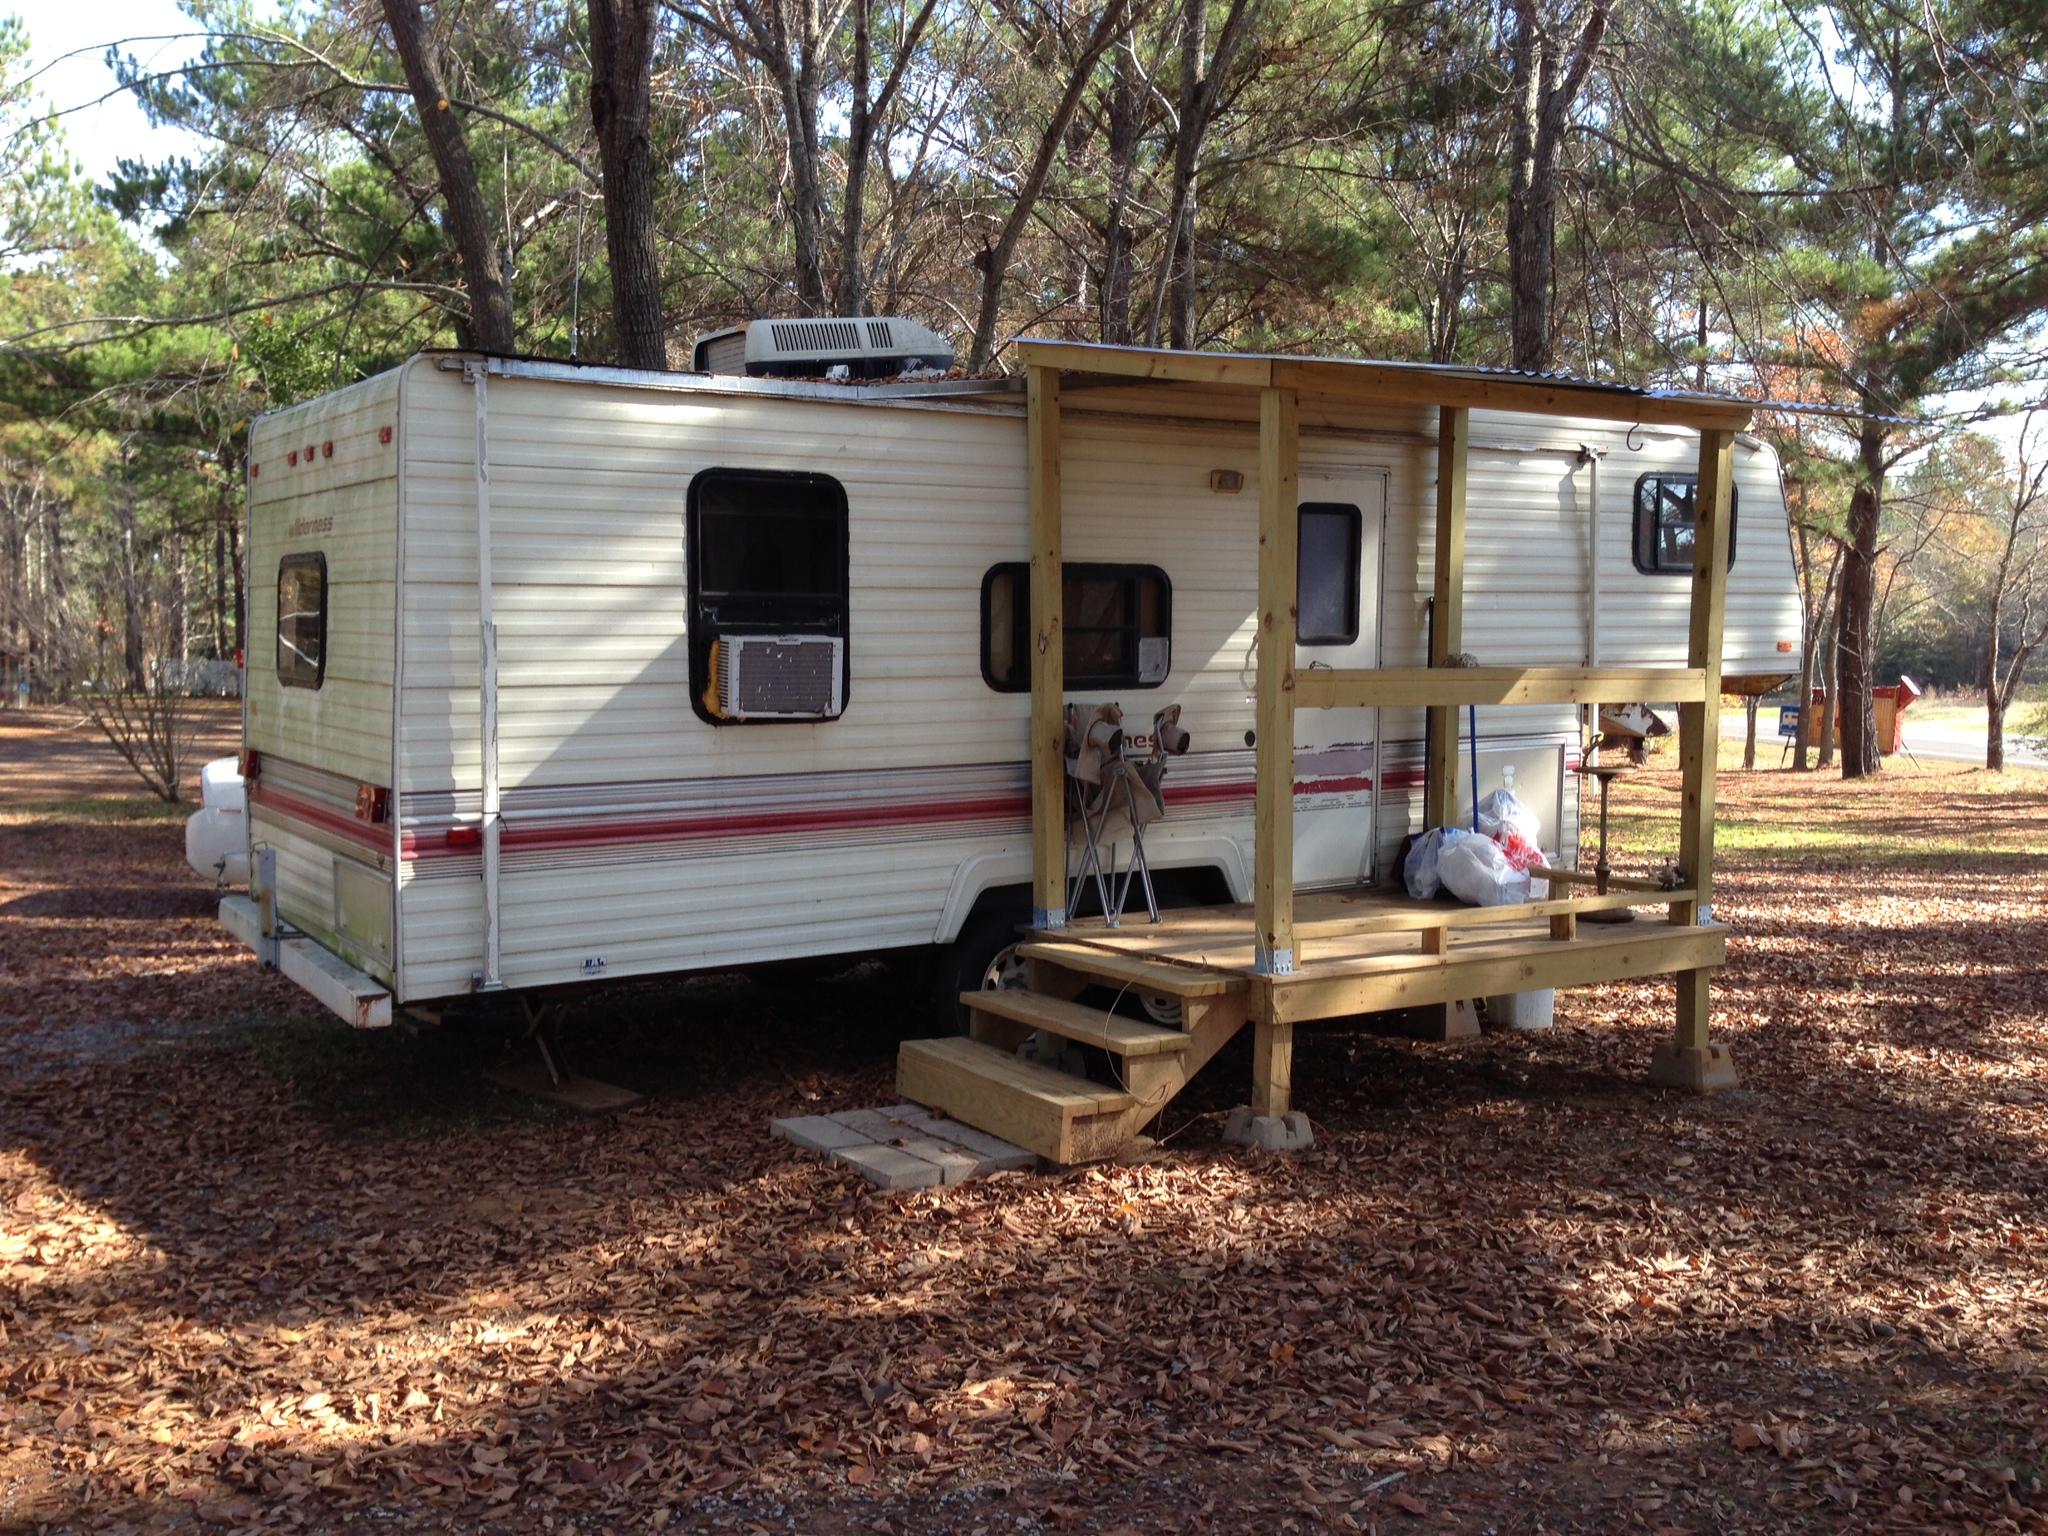 Shady Pines RV Park 220 County Road 4208 Jacksonville TX 75766